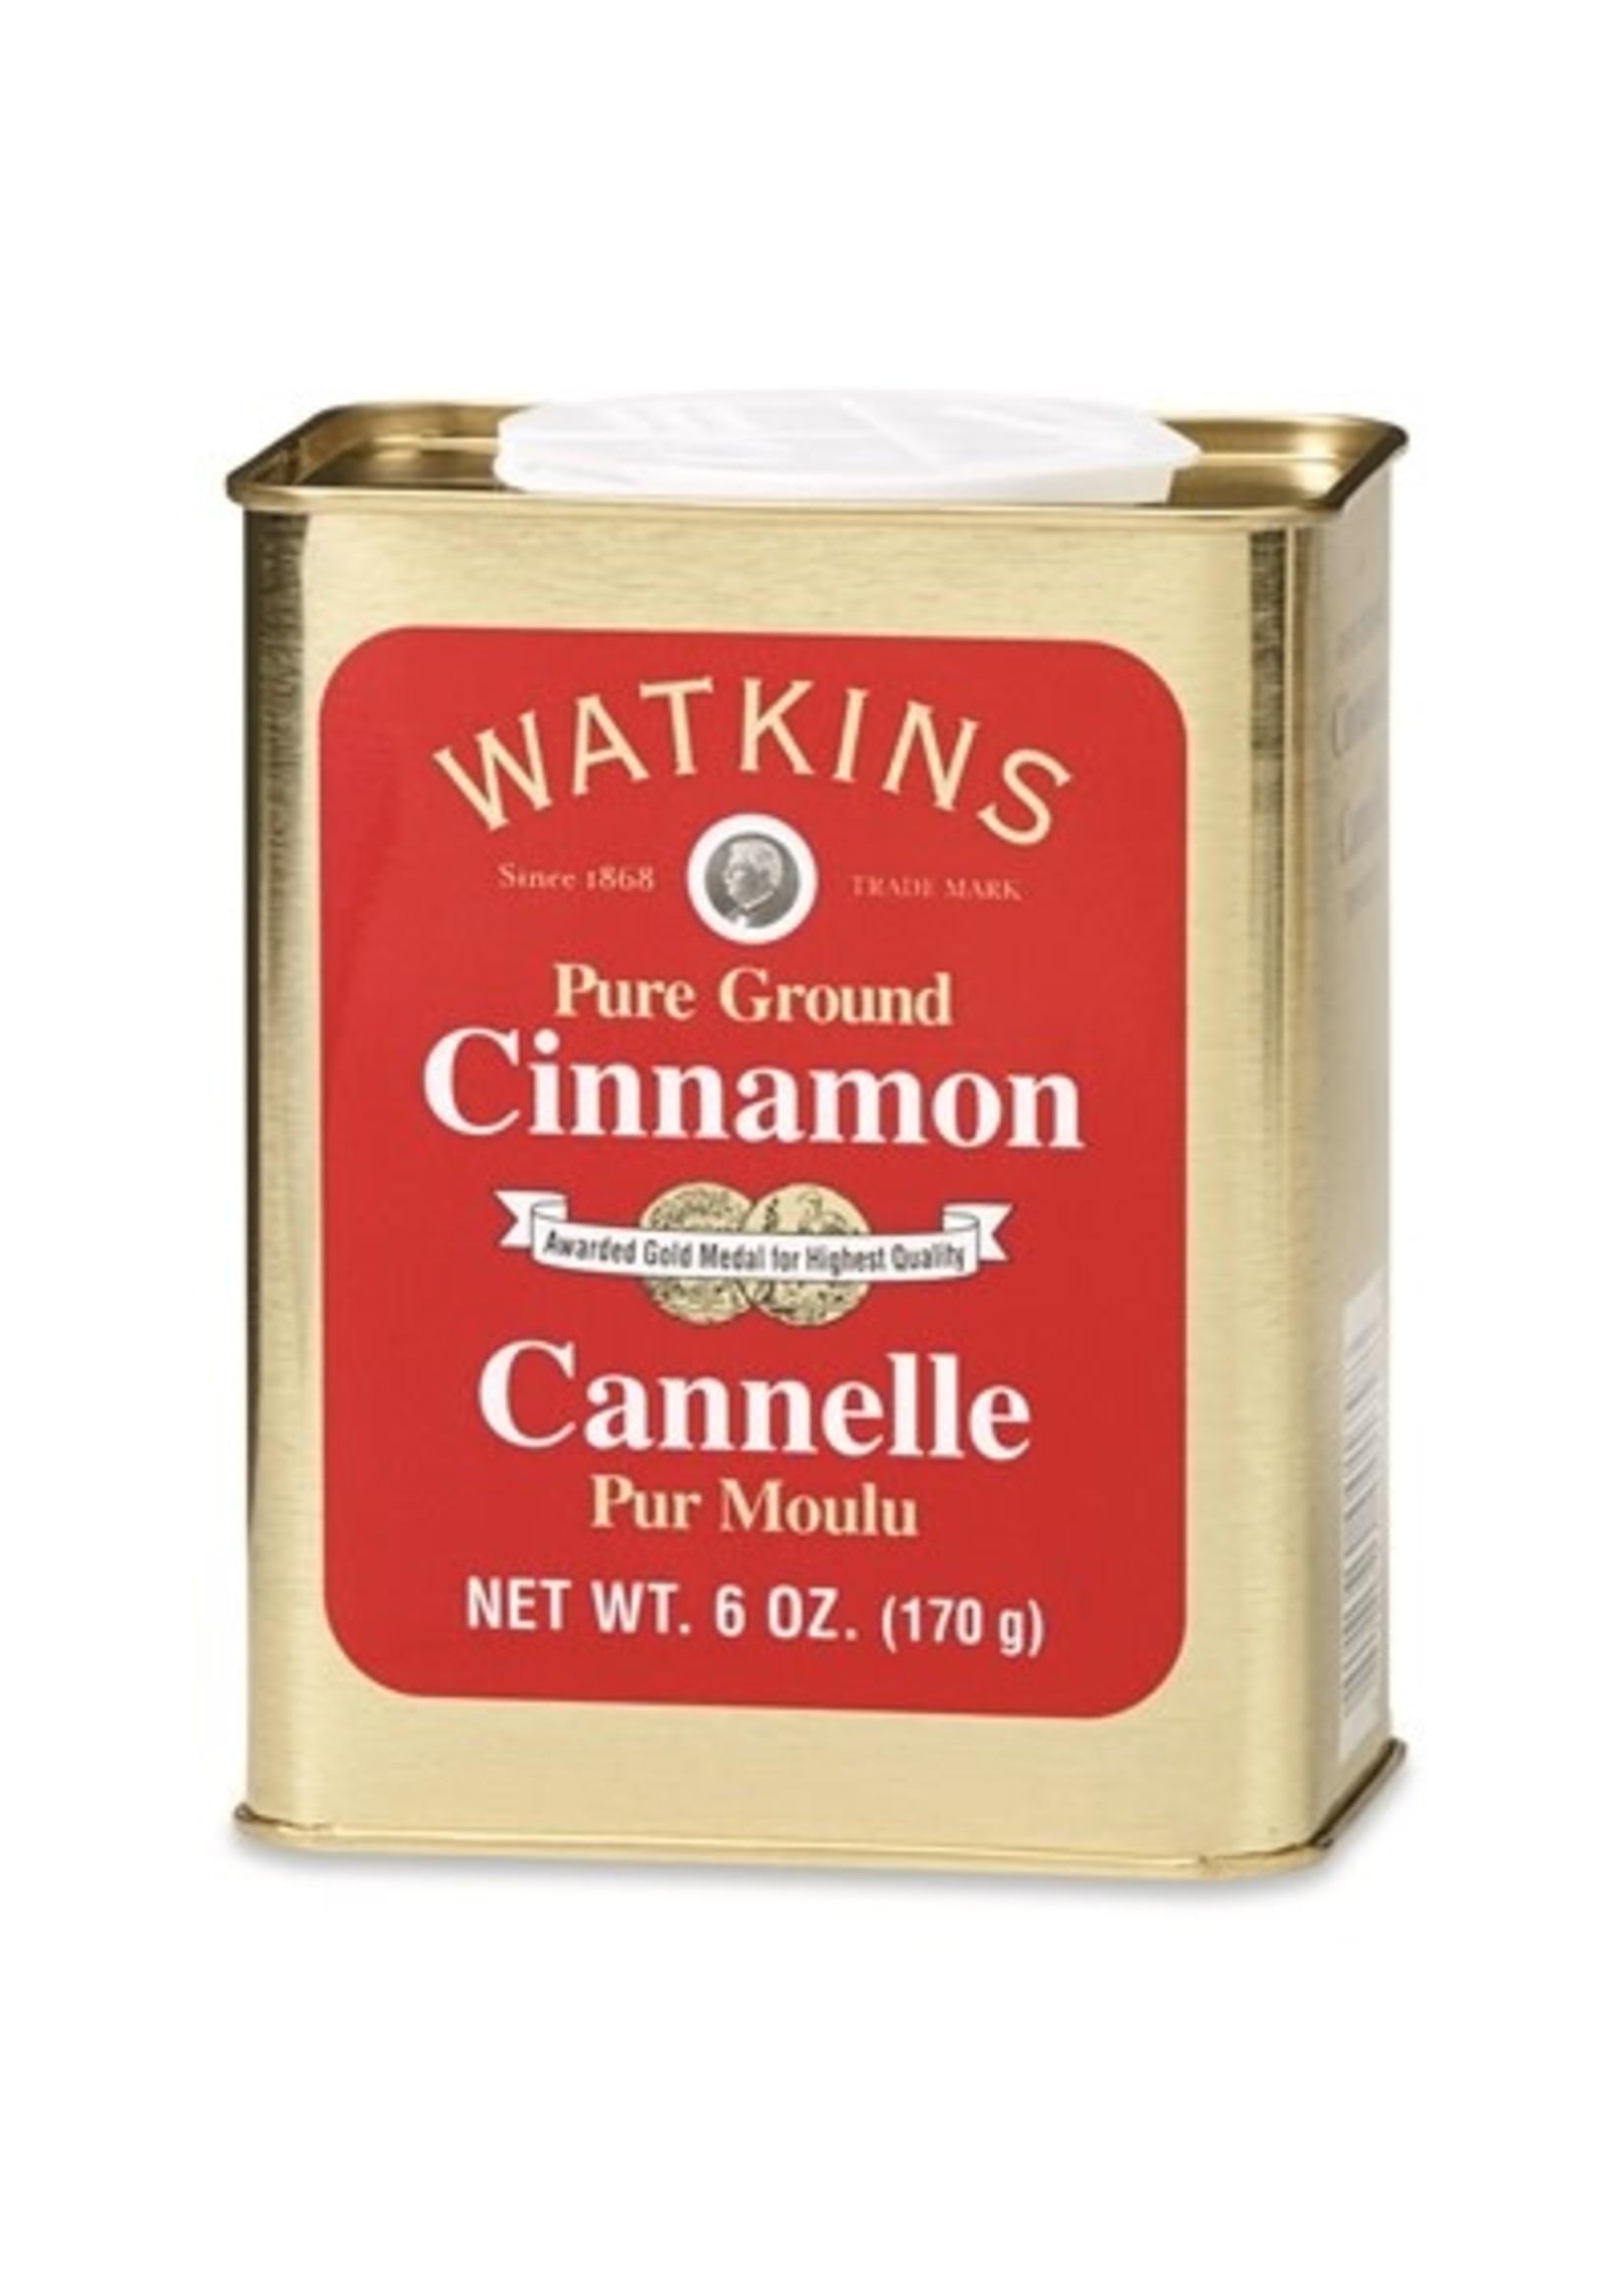 The Watkins Co. Watkins Ground Cinnamon